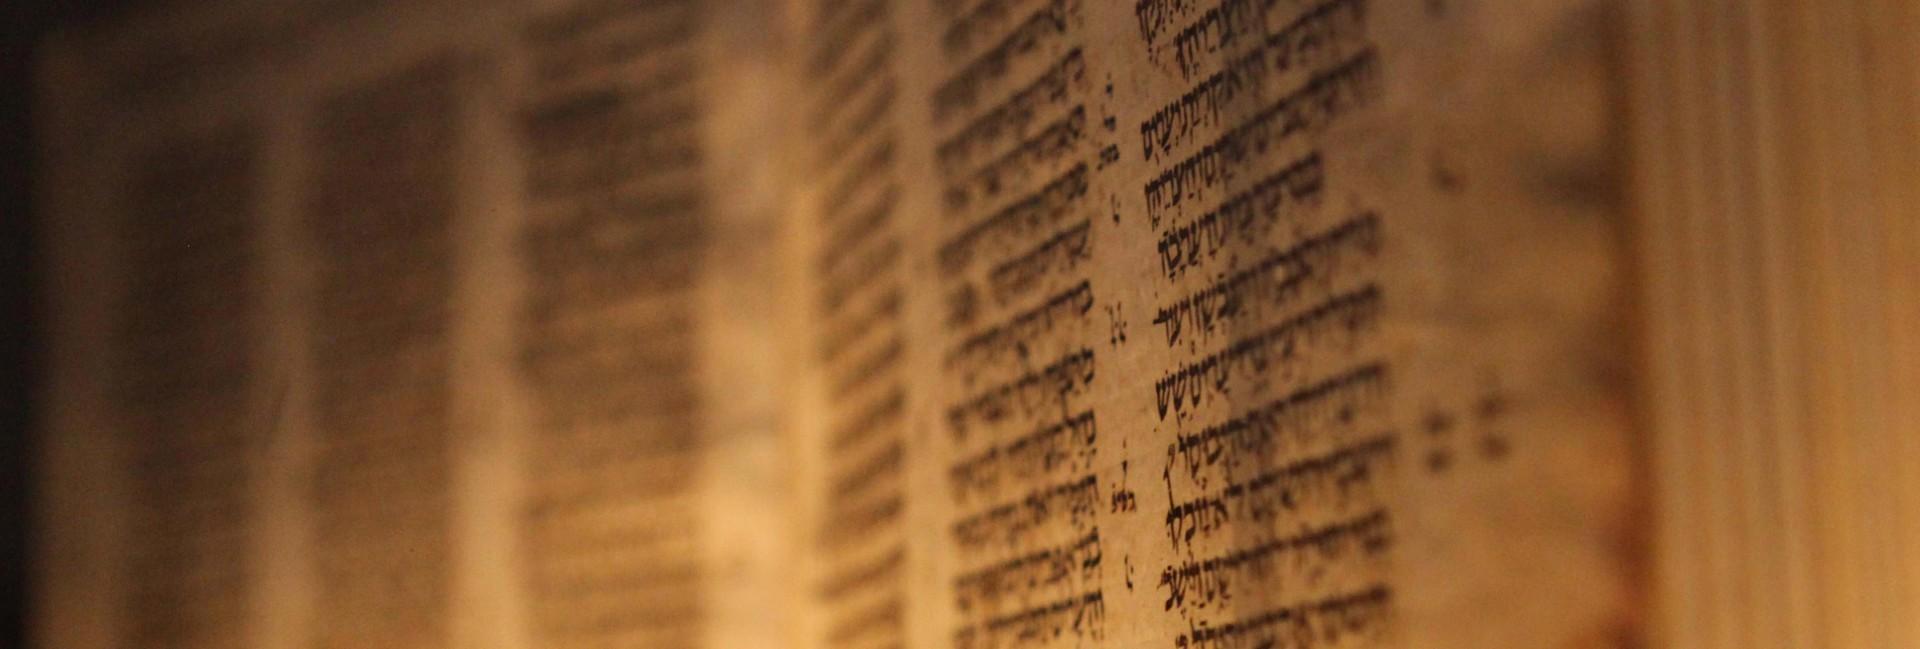 Bibleacademyonline – Verse-by-Verse Bible Studies from the